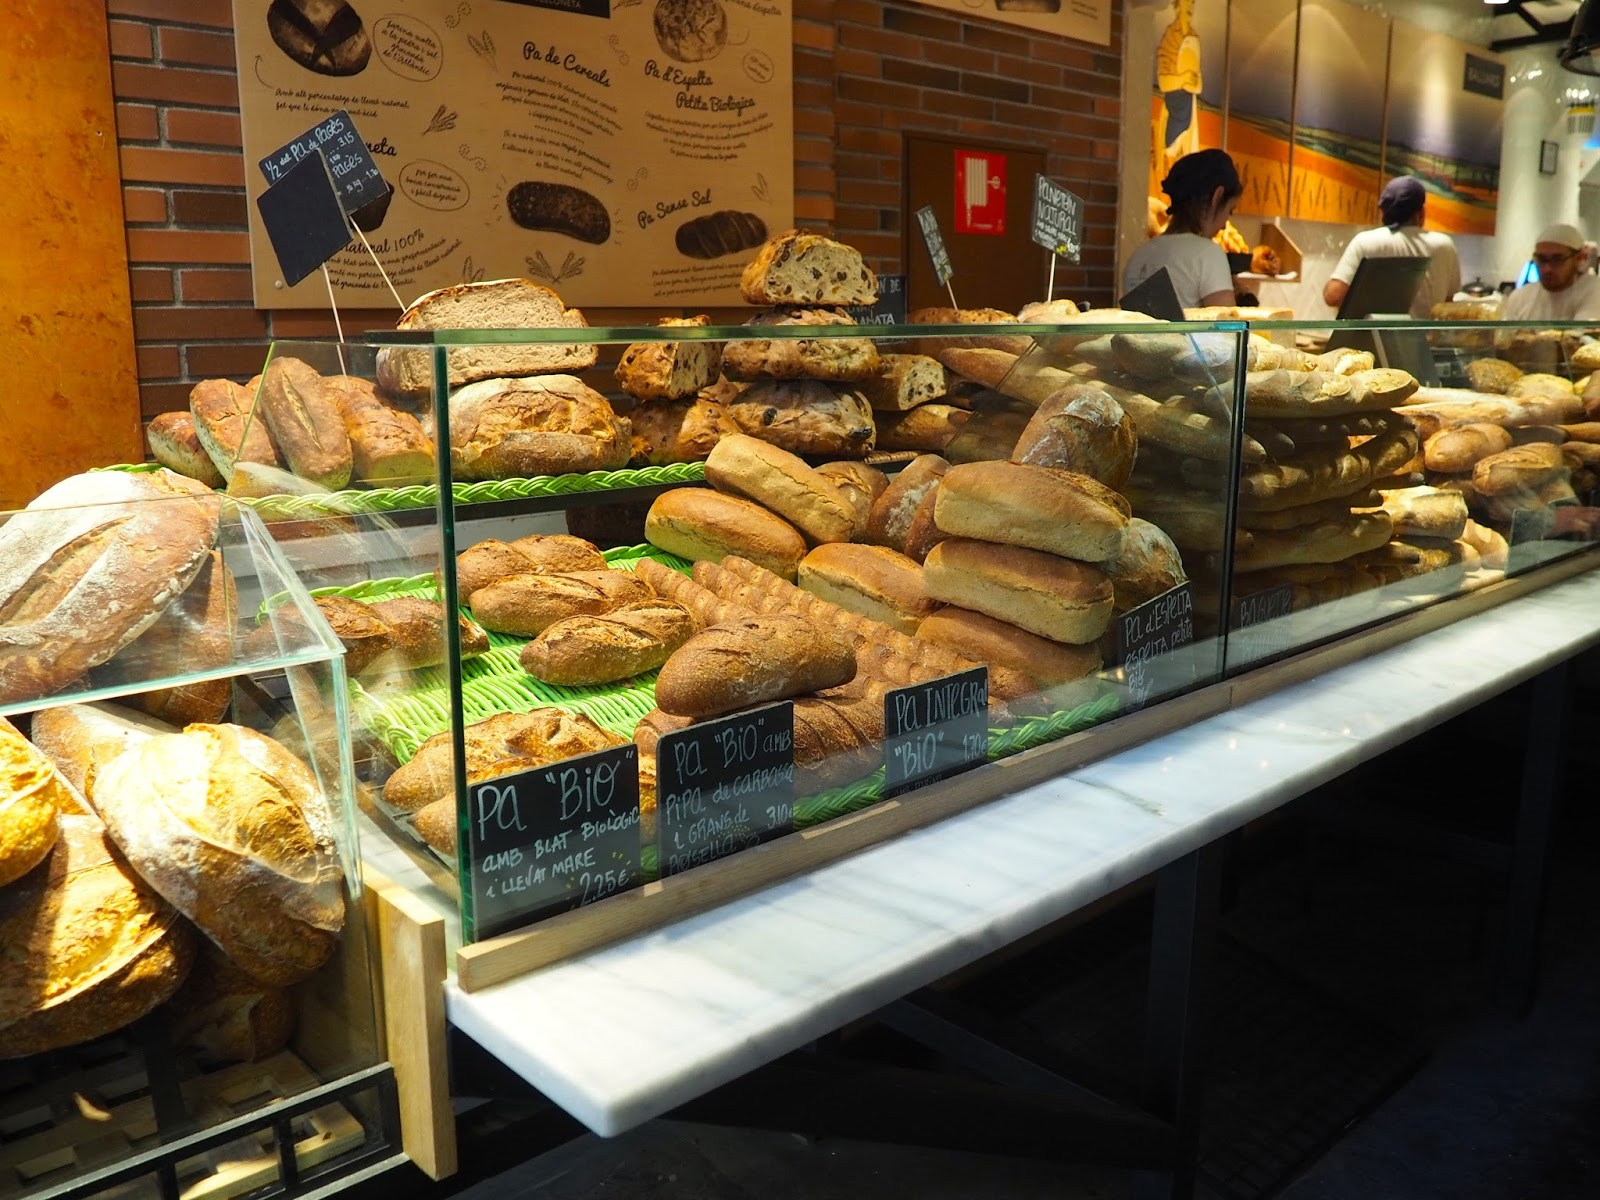 Barcelona Baluard Cafe Bakery Blog Post Review